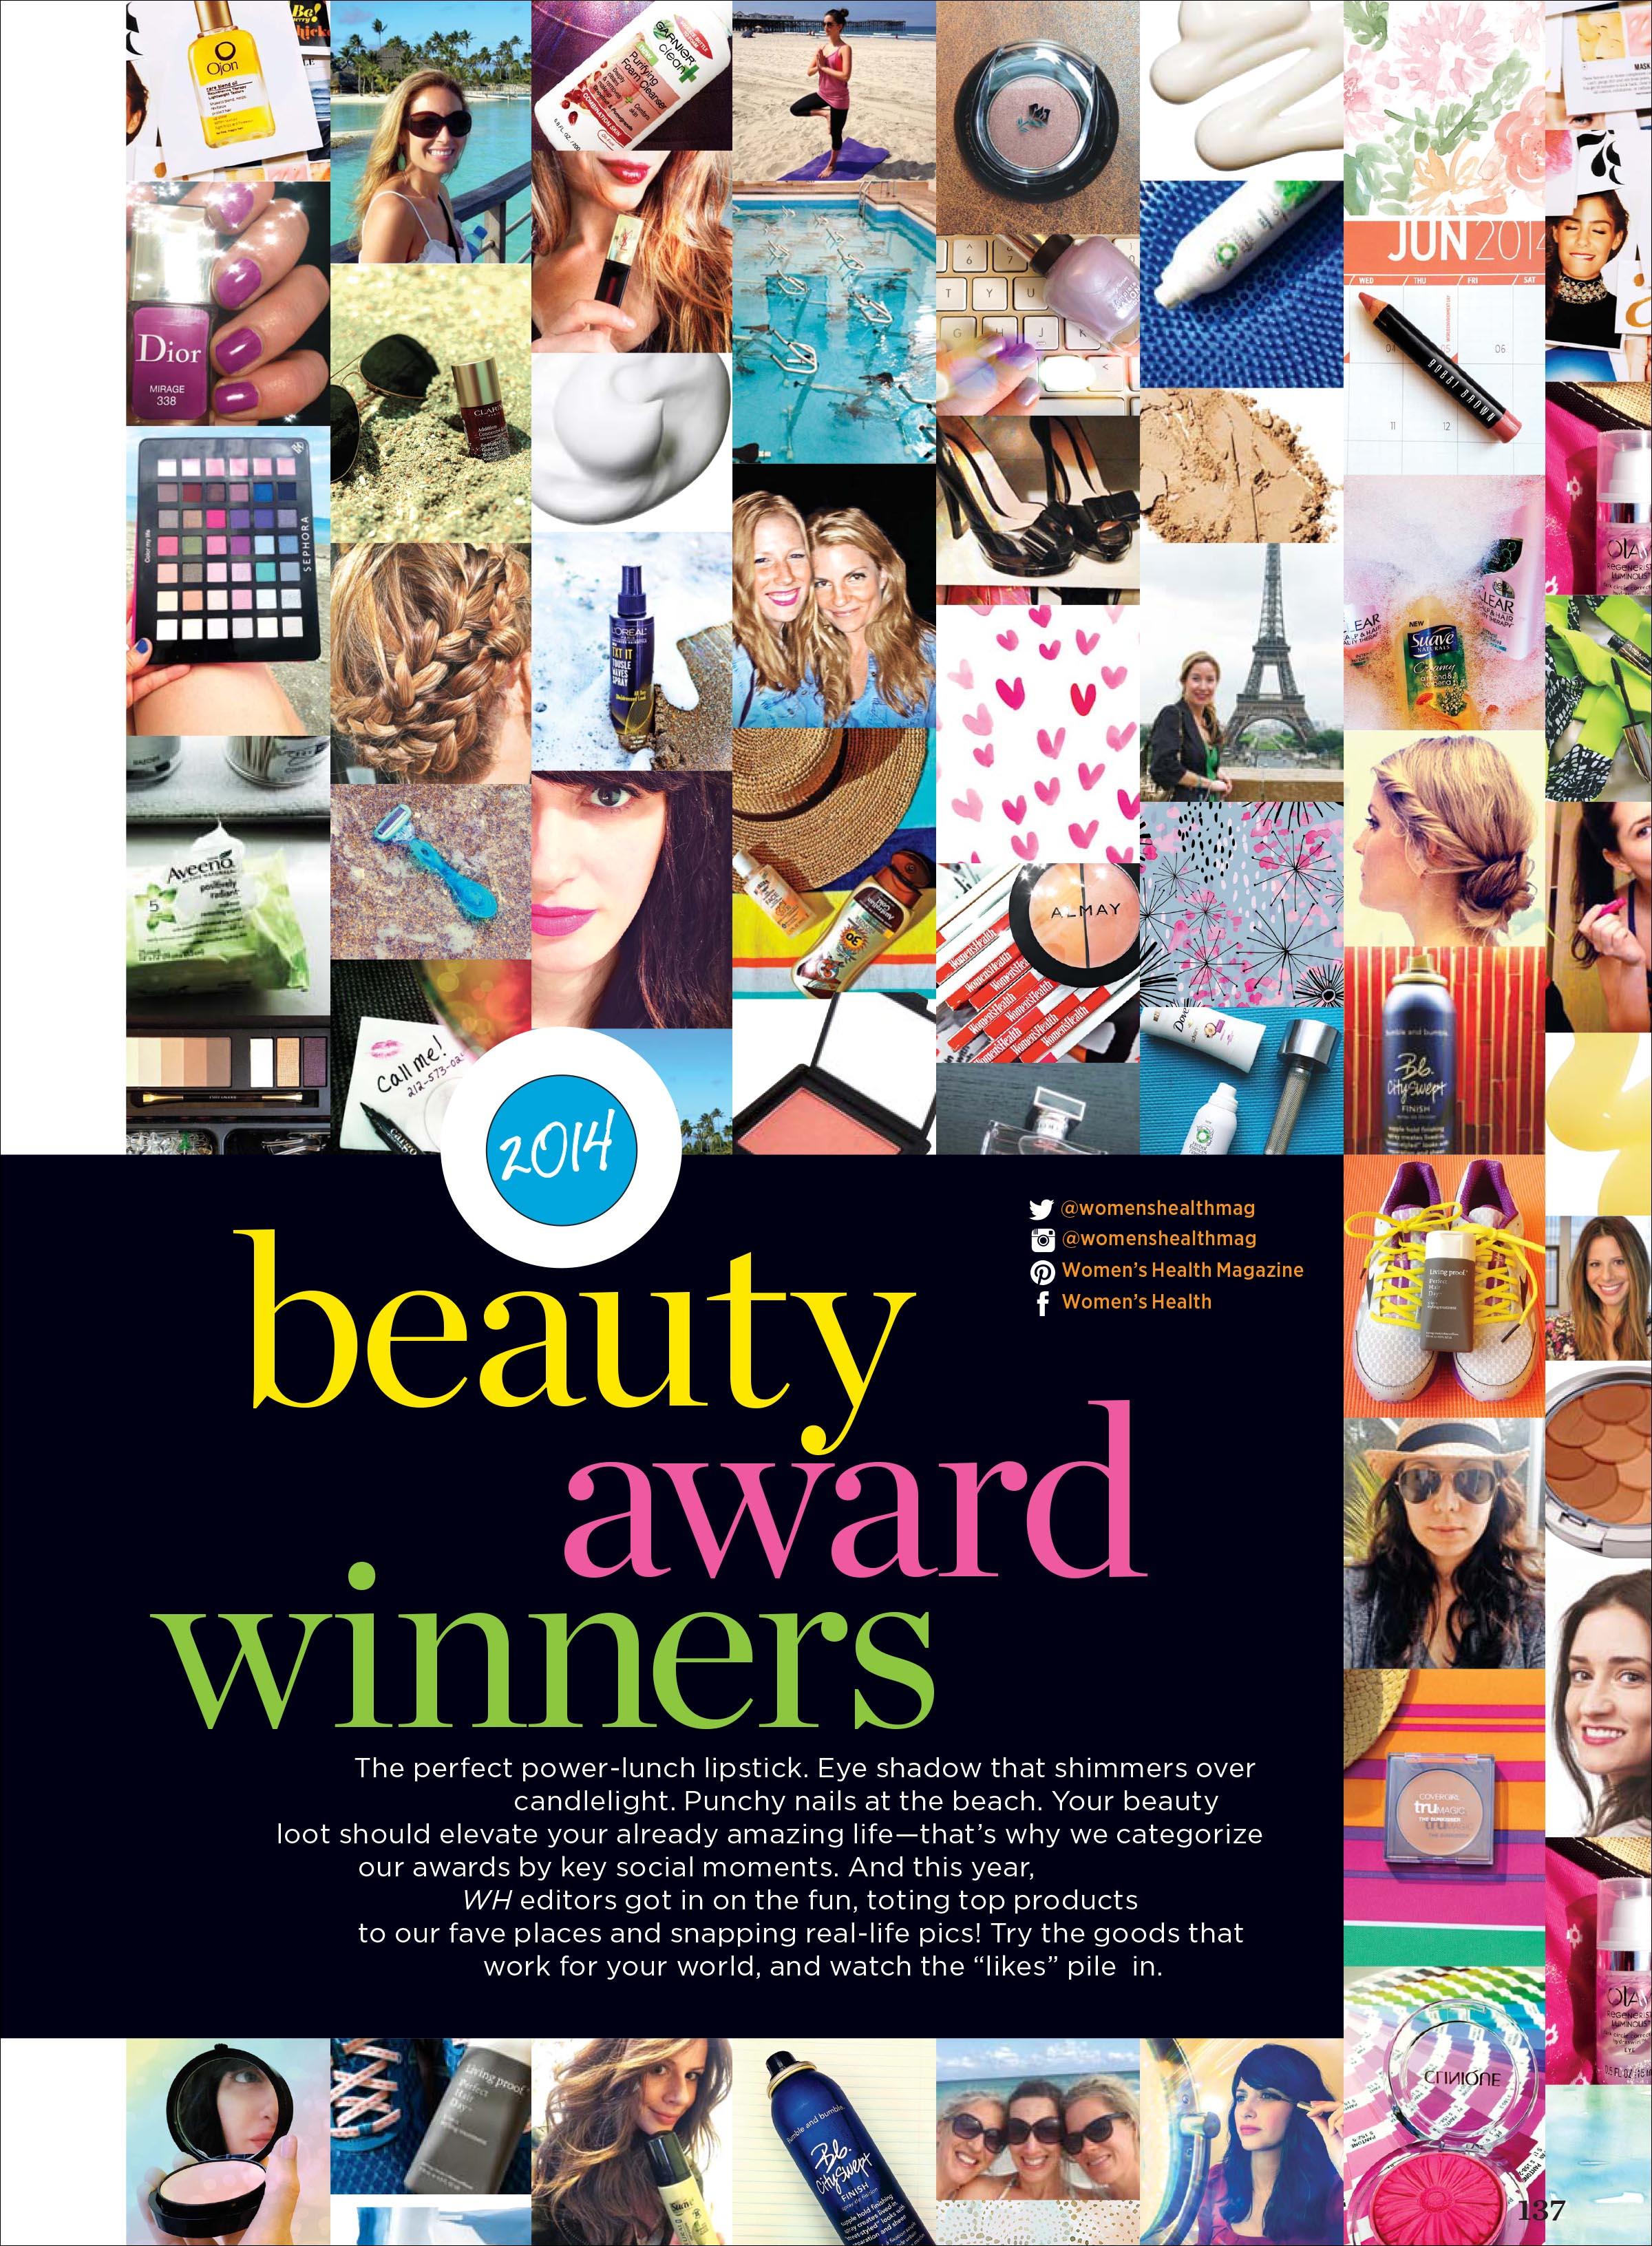 WH0614_FEA_BeautyAwards_SHIPPED-1.jpg